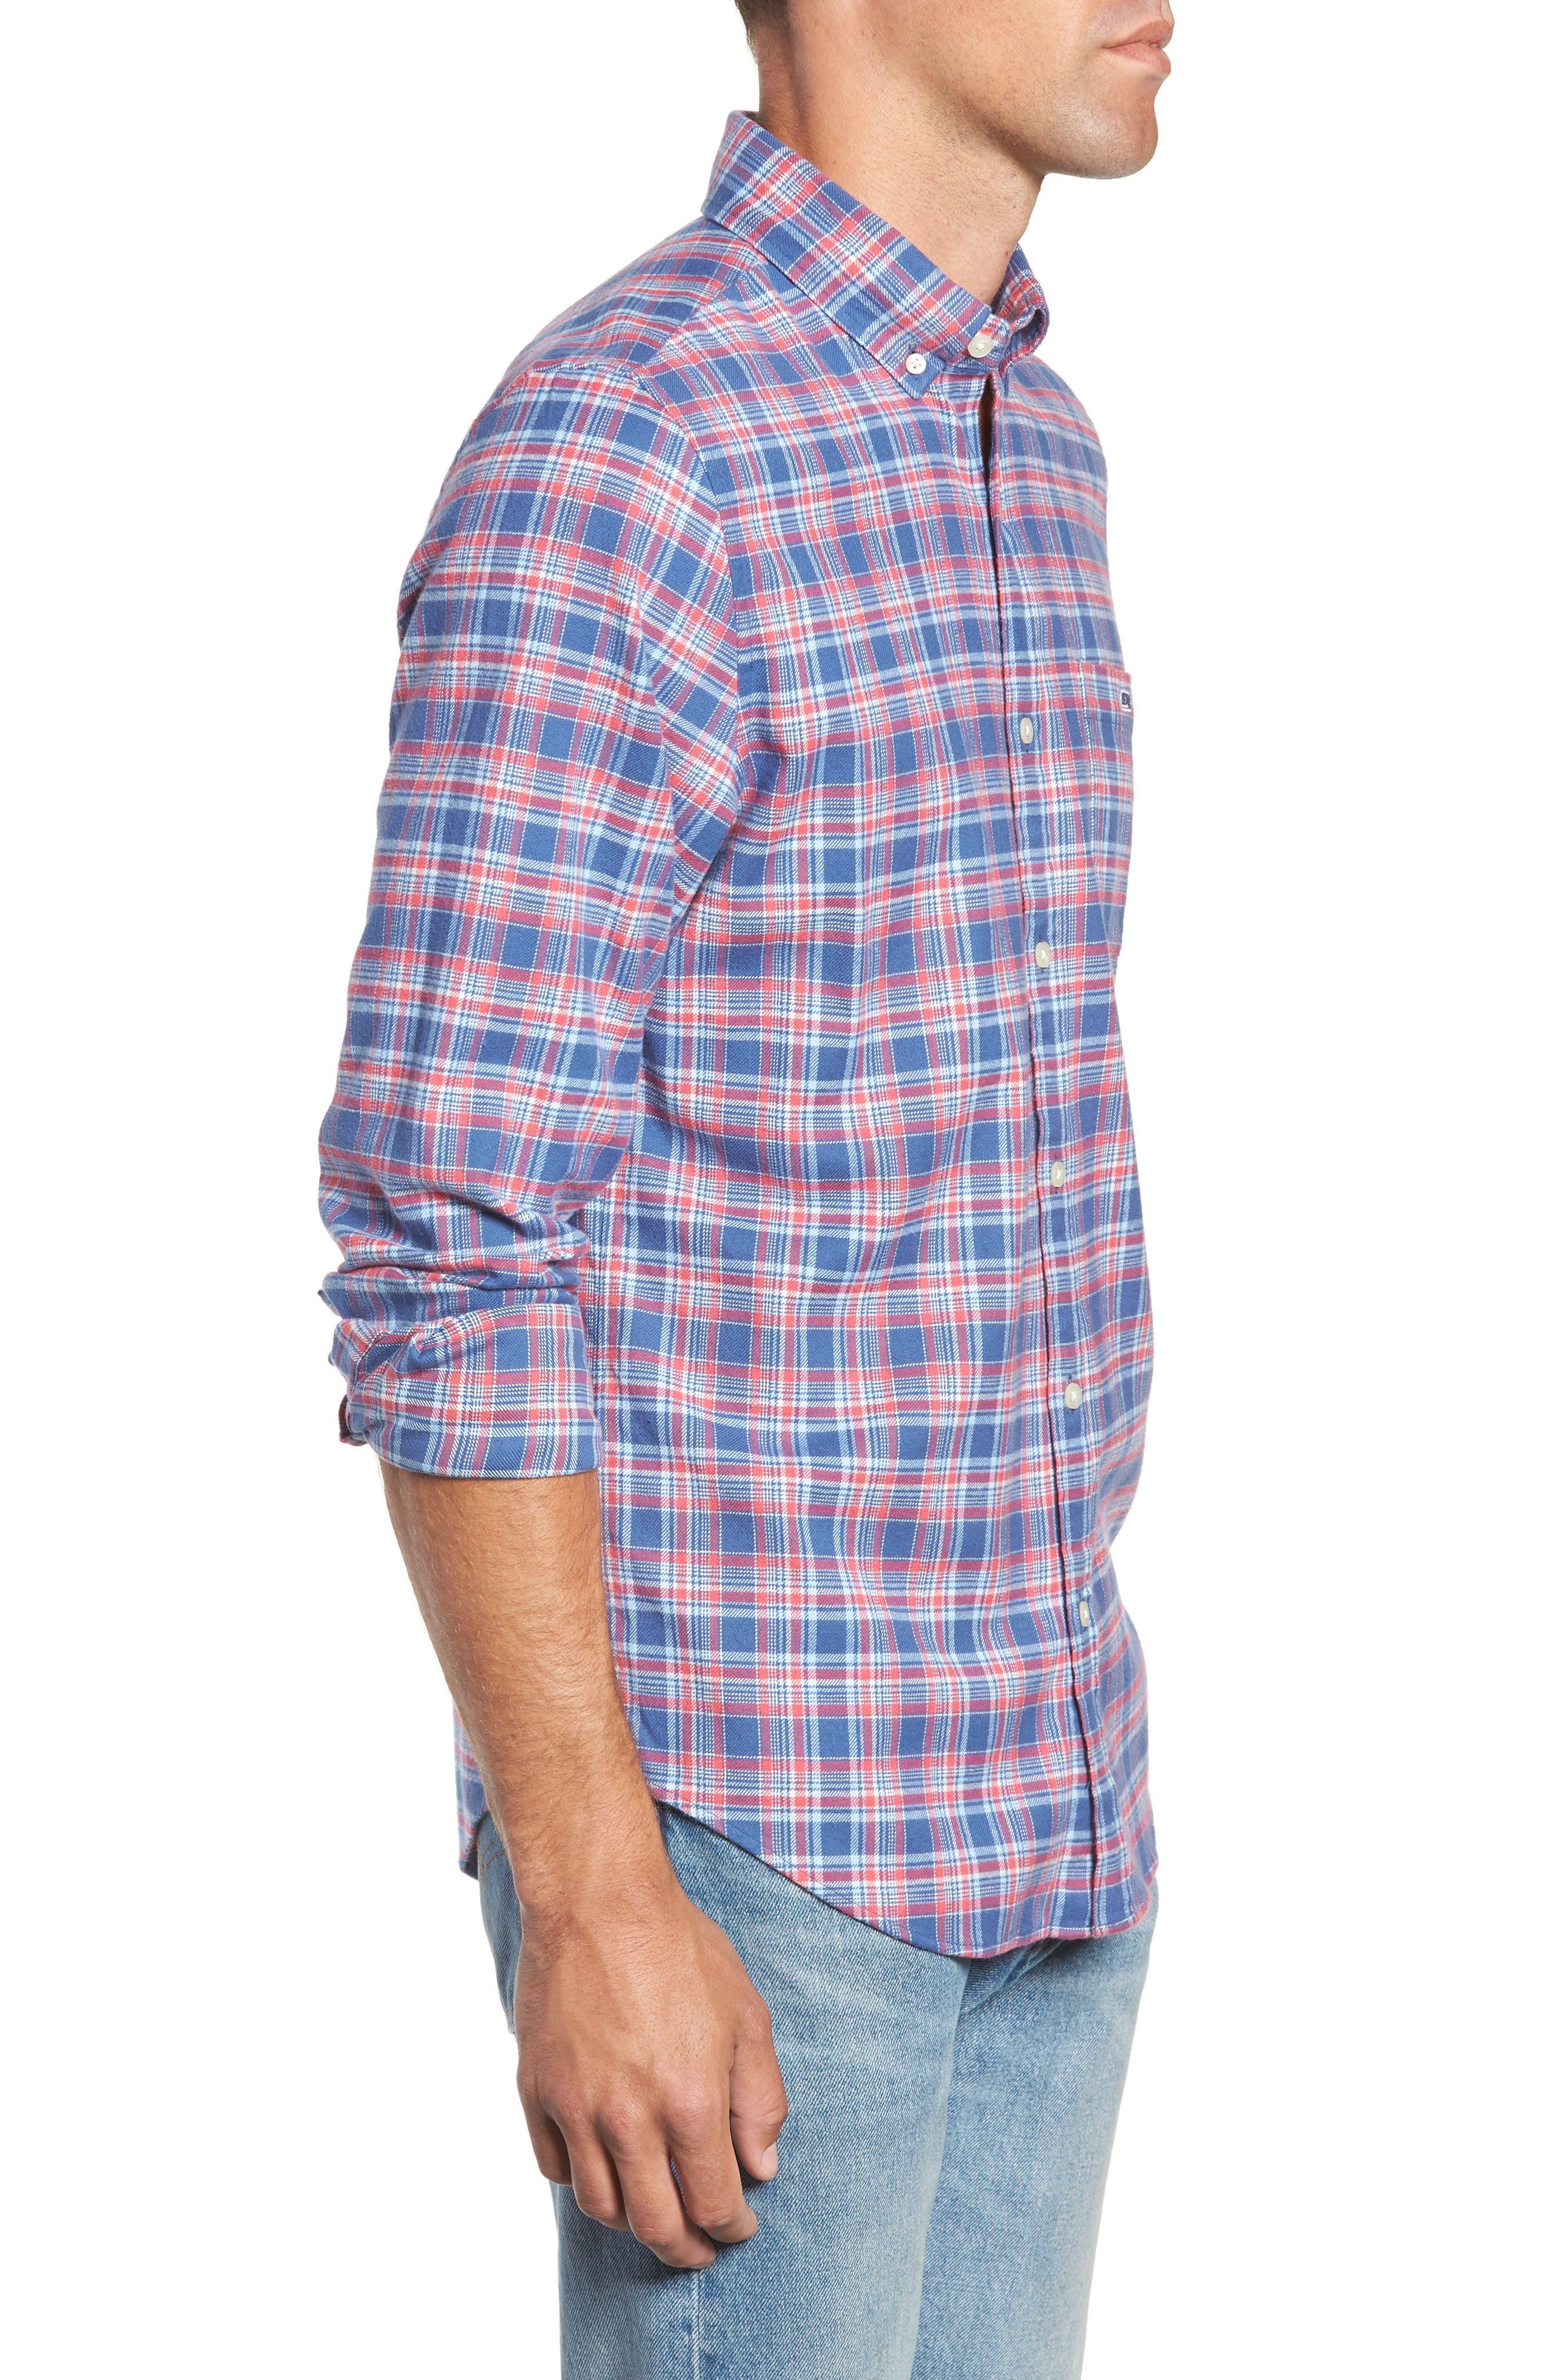 VINEYARD VINES,                             Lockwood Regular Fit Plaid Flannel Shirt,                             Alternate thumbnail 4, color,                             463